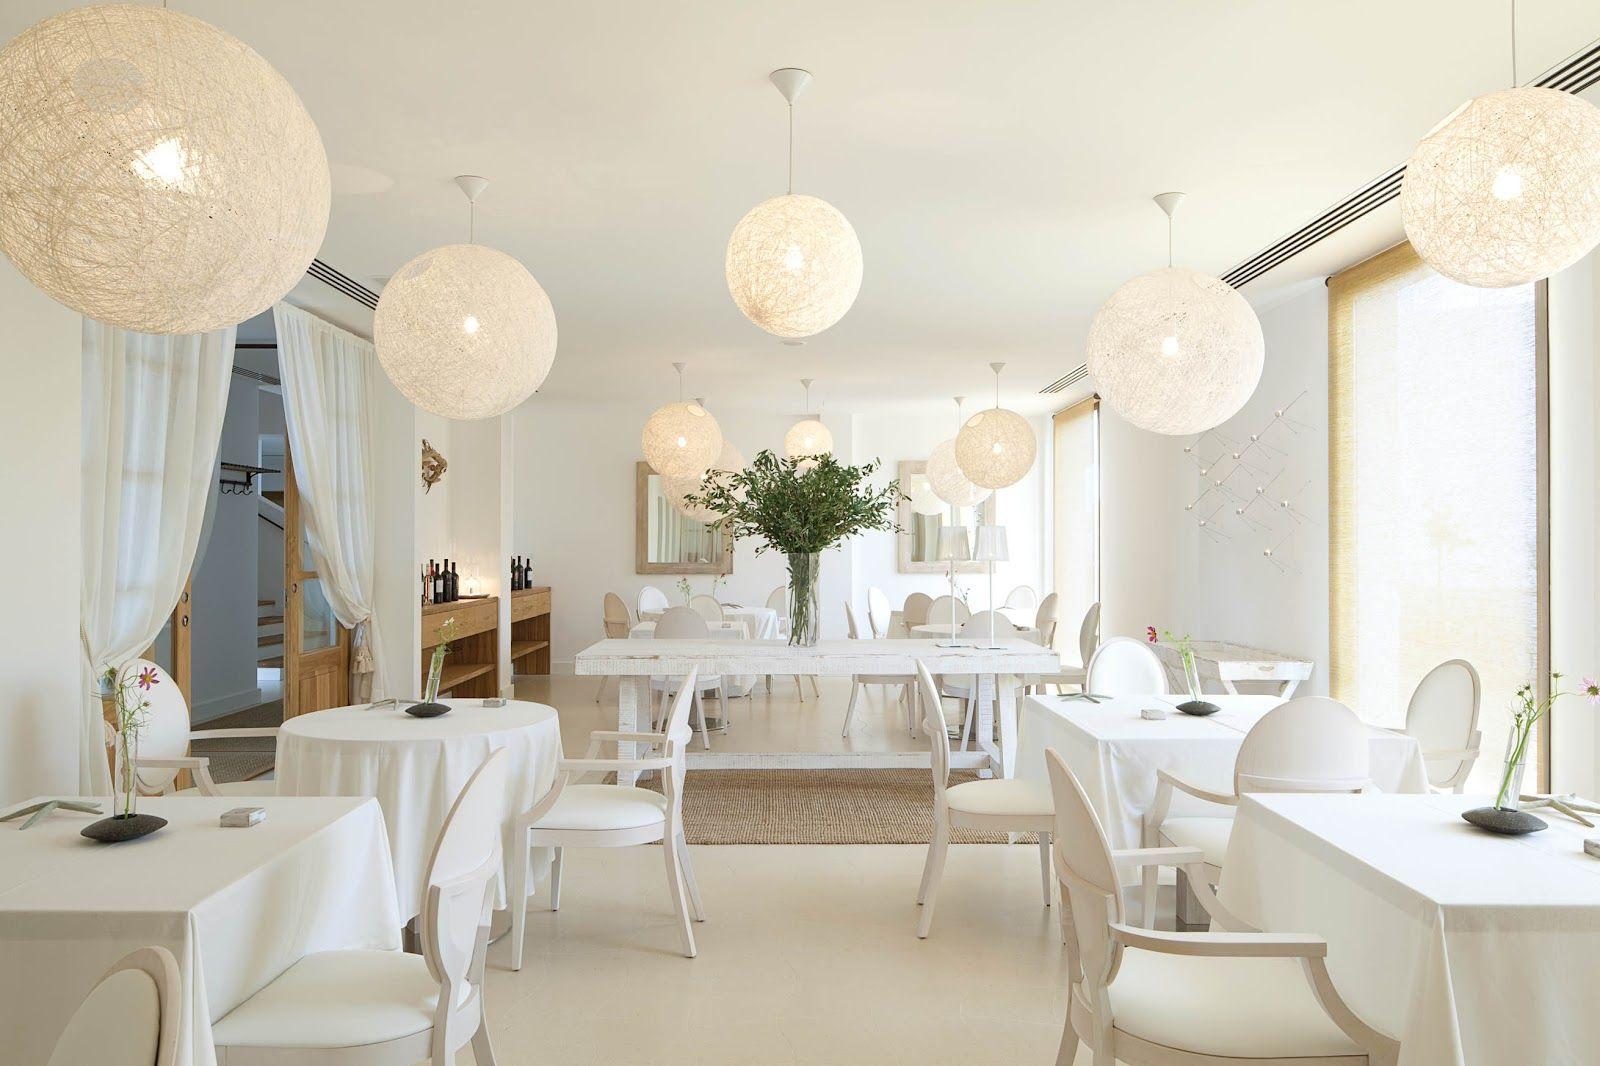 Interiorismo Decoracion Restaurante Hosteleria Cafeteria  # Muebles Lazaro Zaragoza